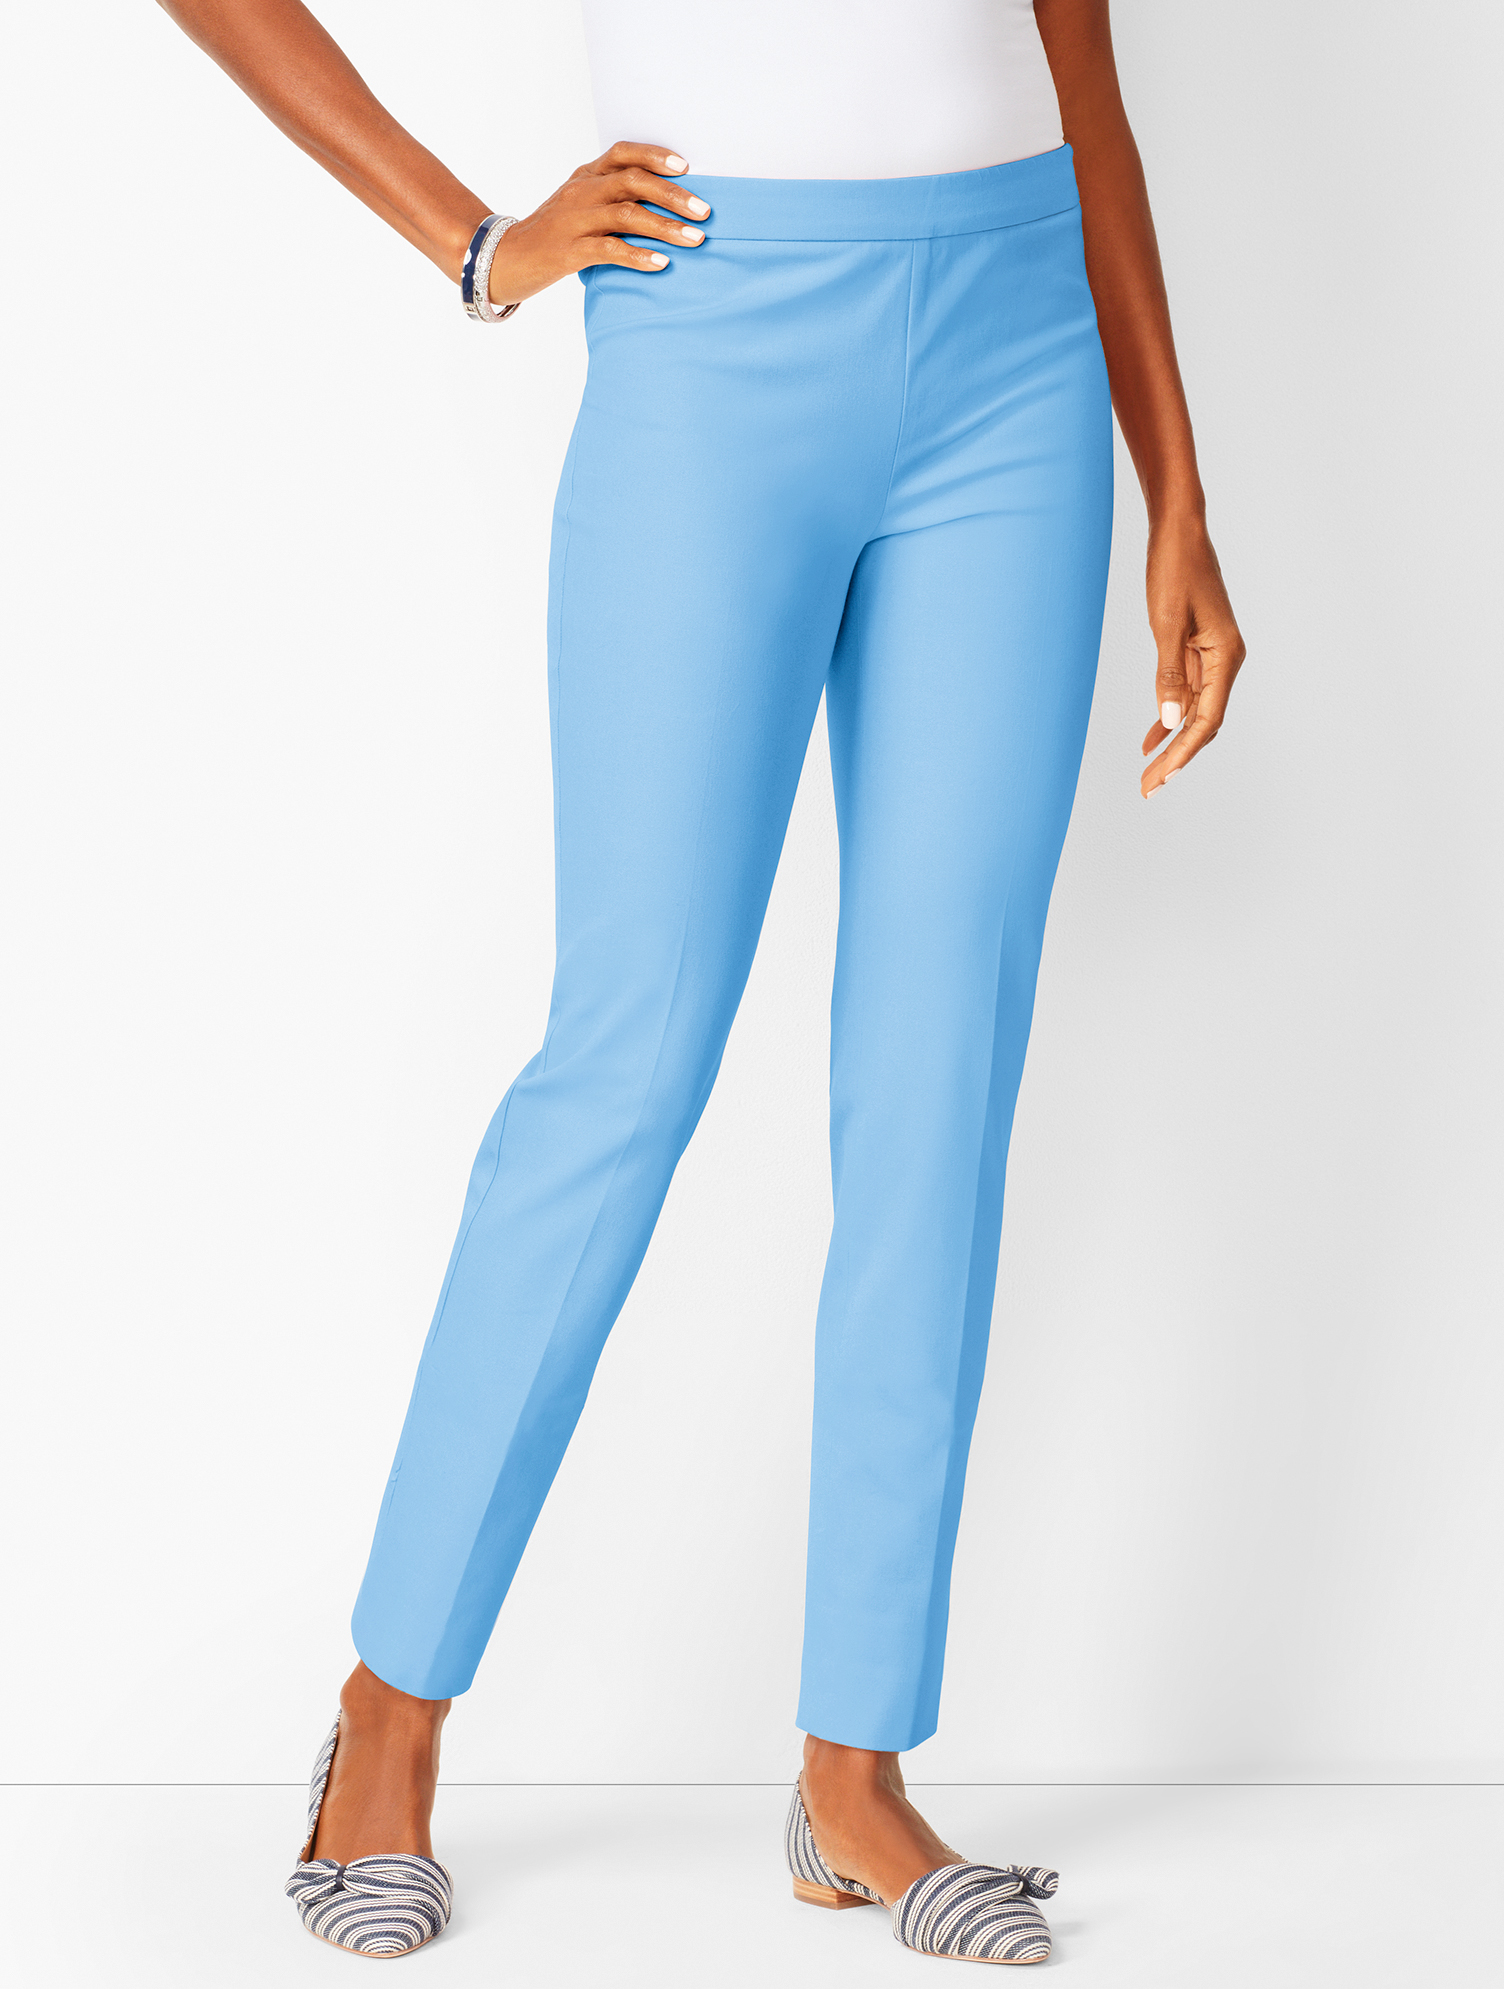 60s – 70s Pants, Jeans, Hippie, Bell Bottoms, Jumpsuits Chatham Ankle Pant Pants - Solid - COTE-BLUE - 16 - Talbots $48.99 AT vintagedancer.com